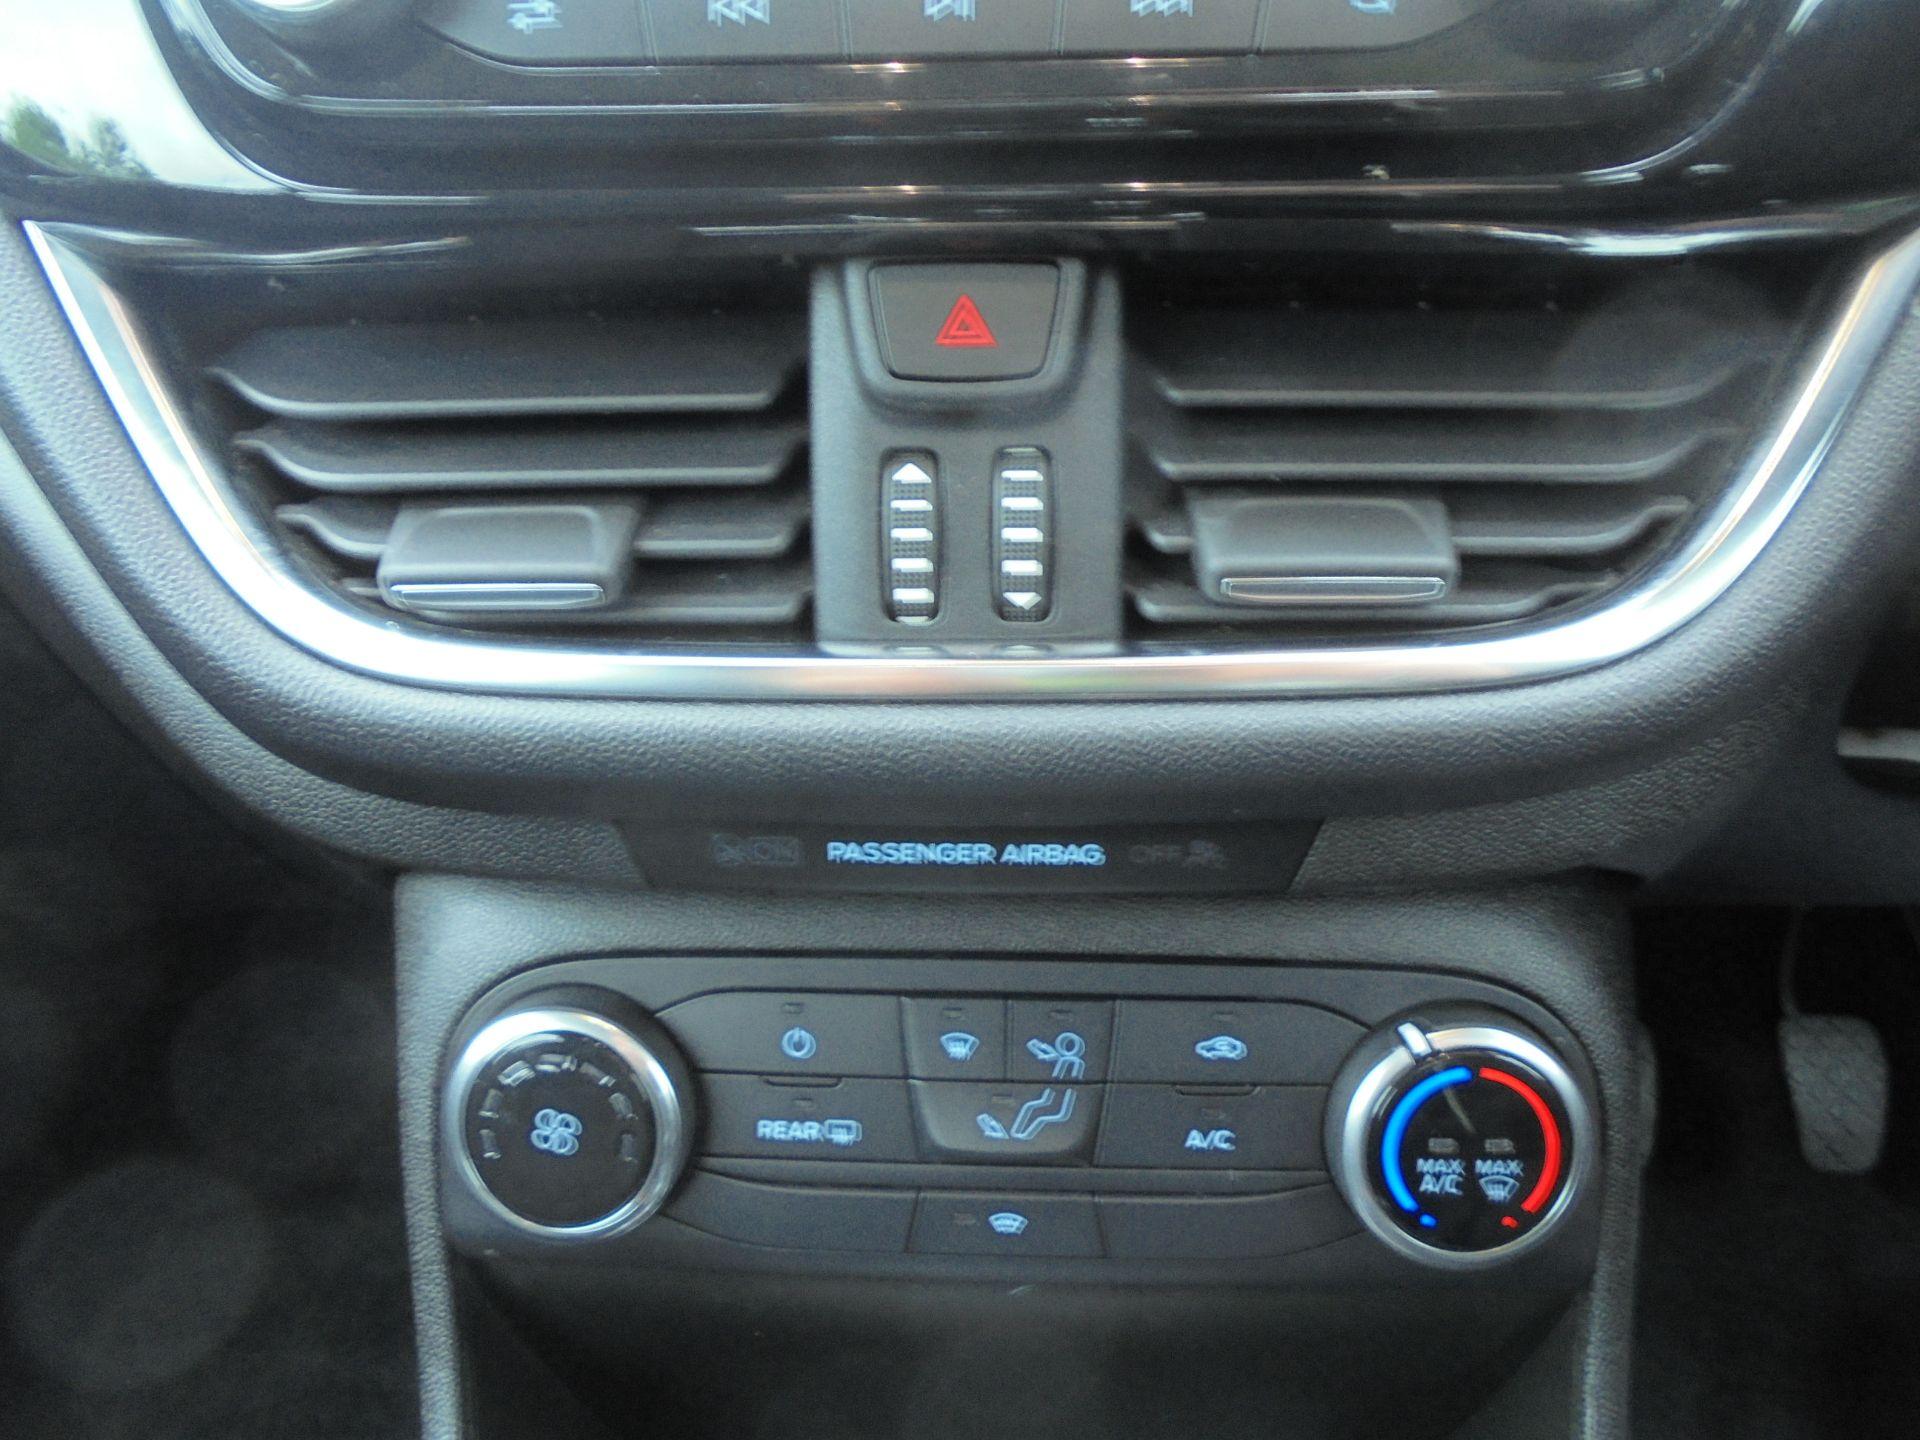 2018 Ford Fiesta 1.5 Tdci Zetec 5Dr (FD18WHU) Image 14